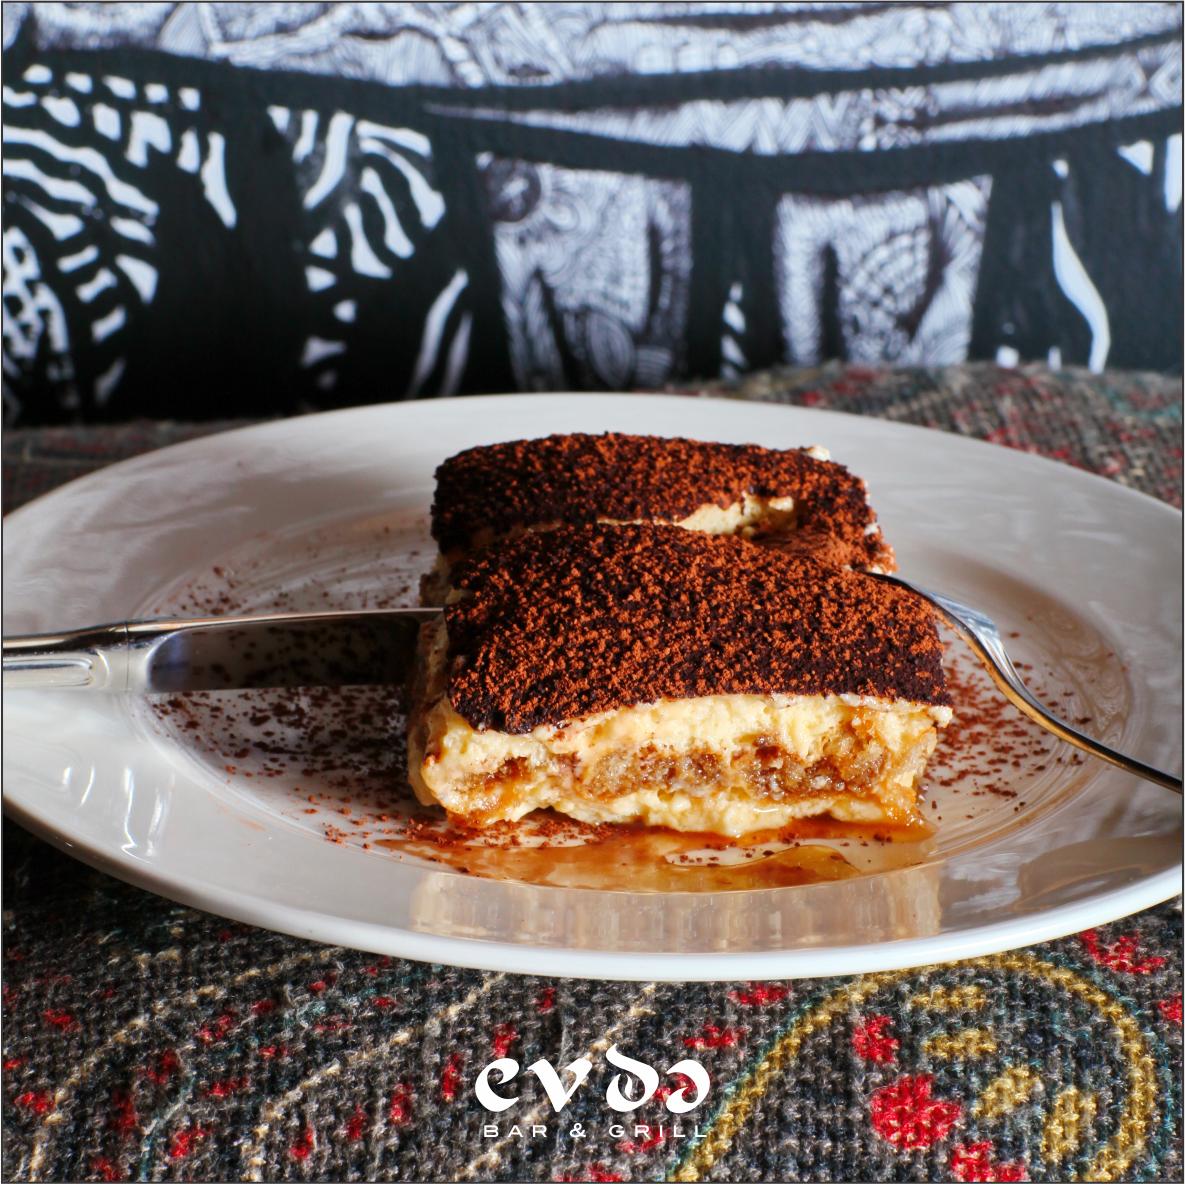 #Evde #restaurant #sweets #dessert #yummy #delicious #homemade #tiramisu #pinterest #Baku #Azerbaijan